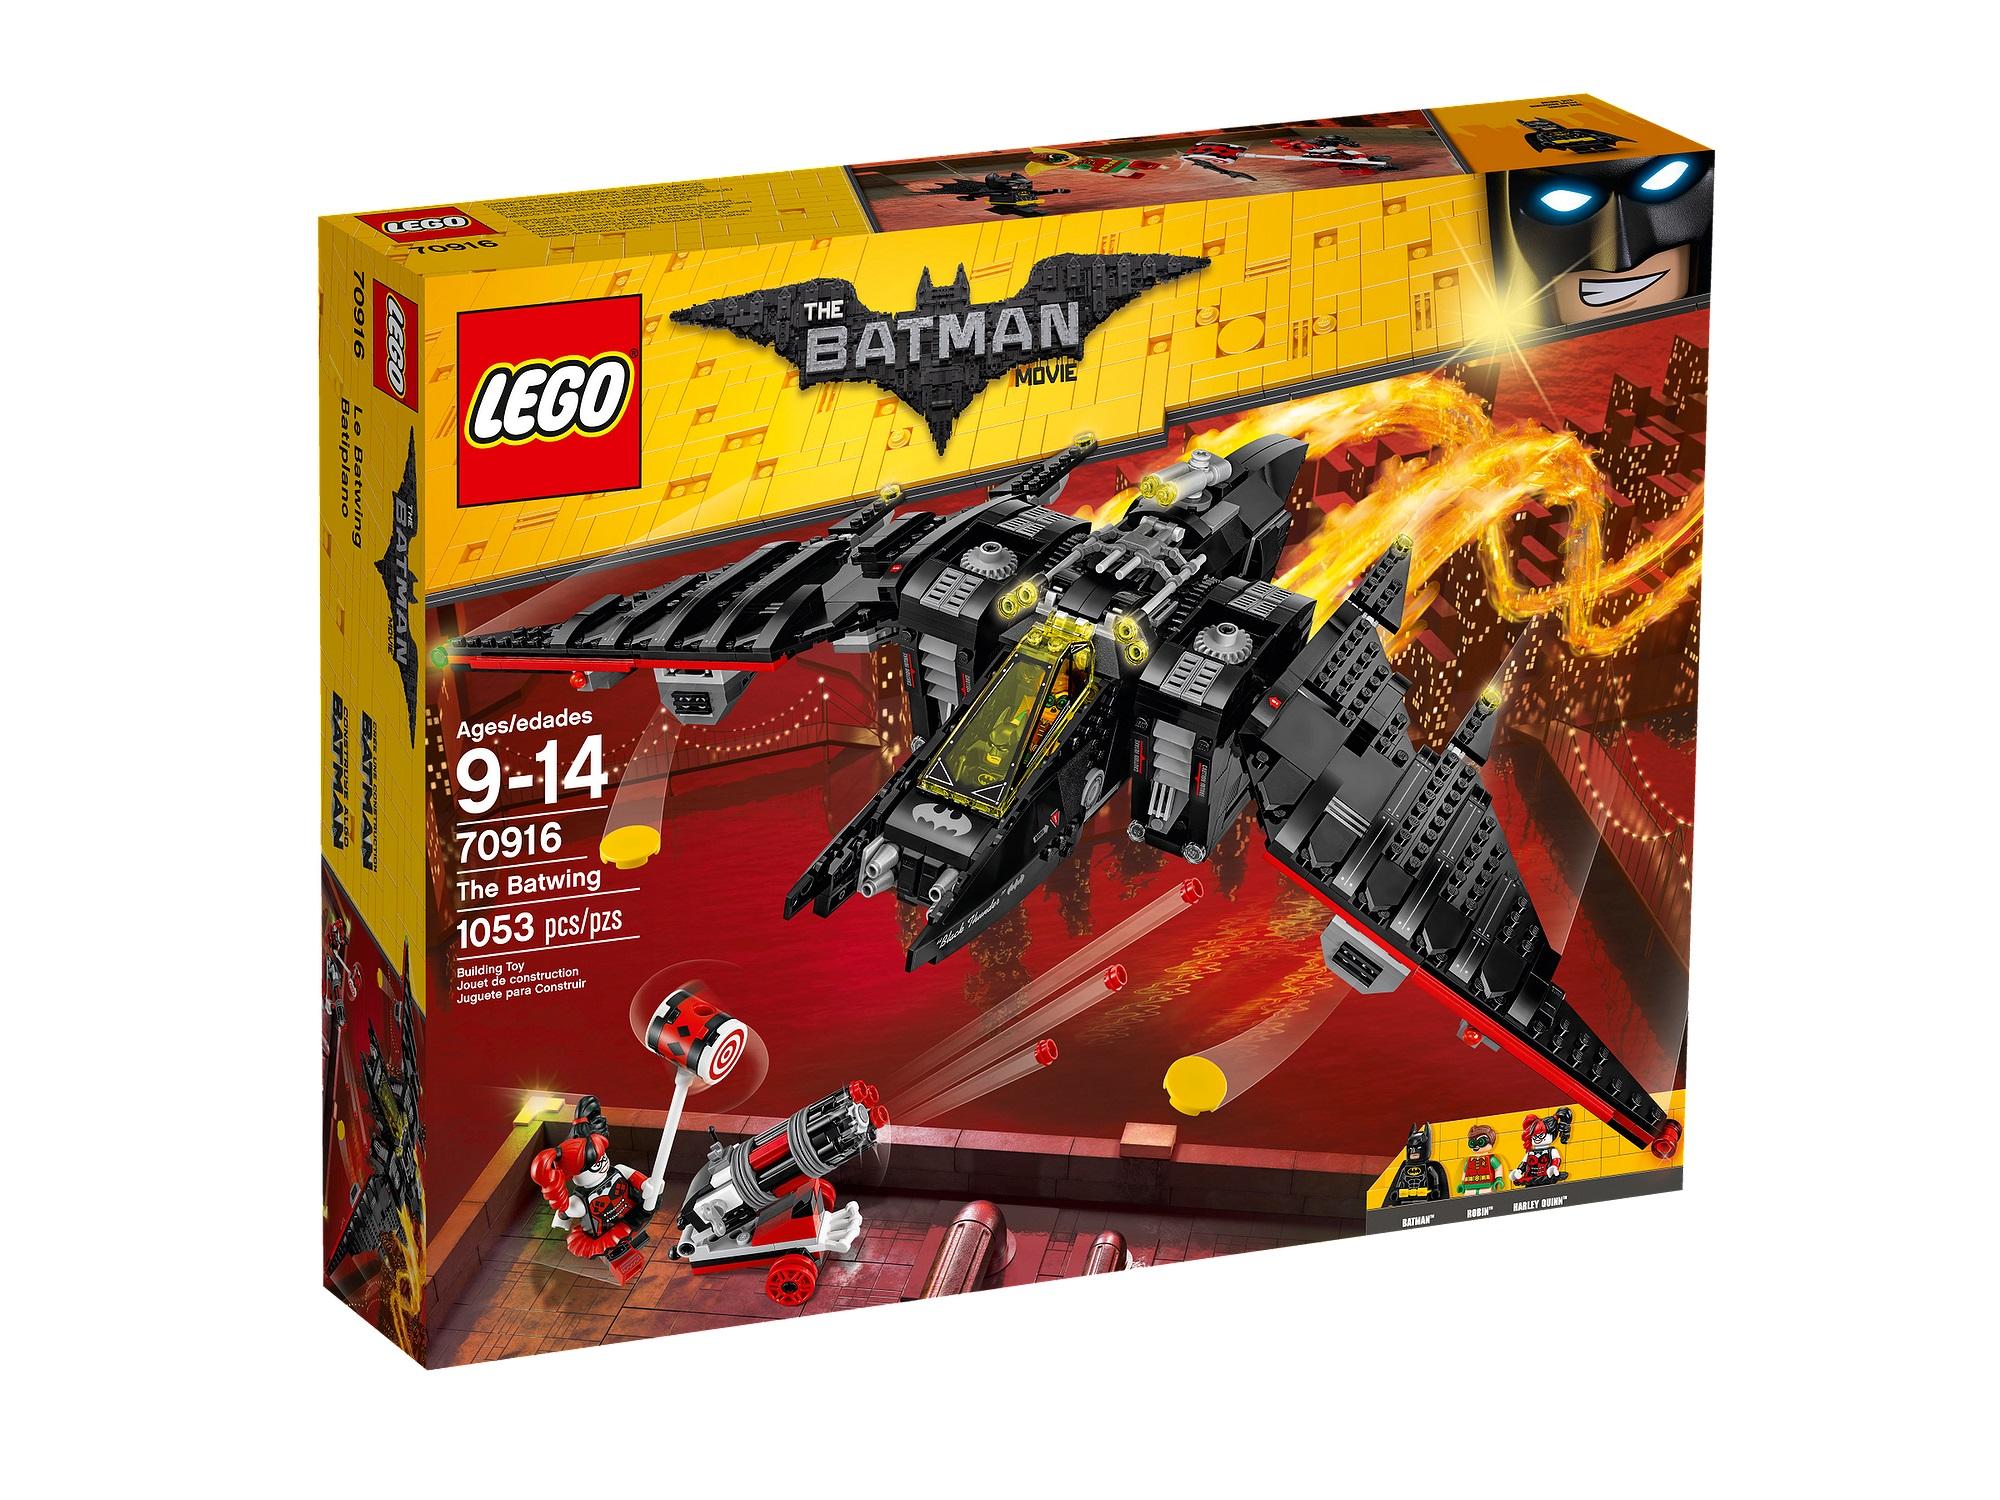 Lego Batman Movie Sets